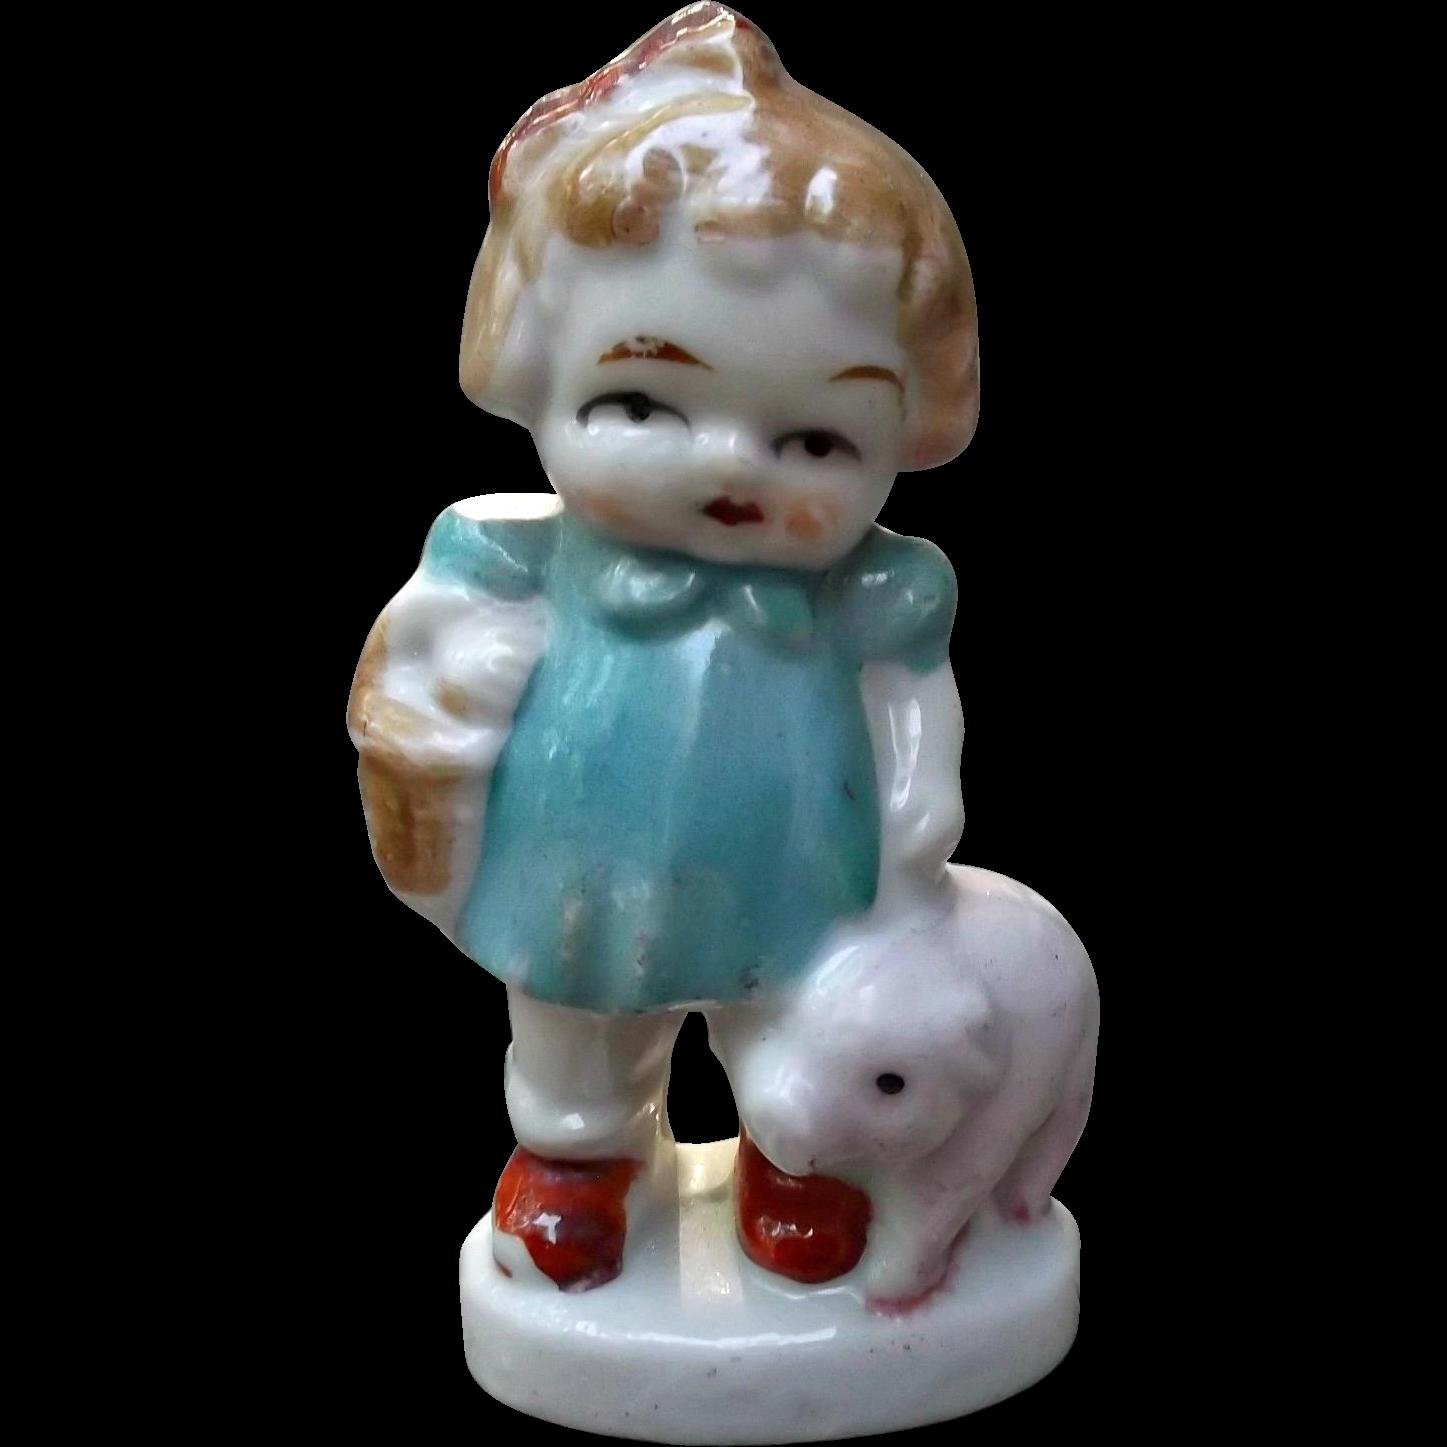 Vintage Bisque Doll Figurine Girl with Basket and Pet Pig Japan